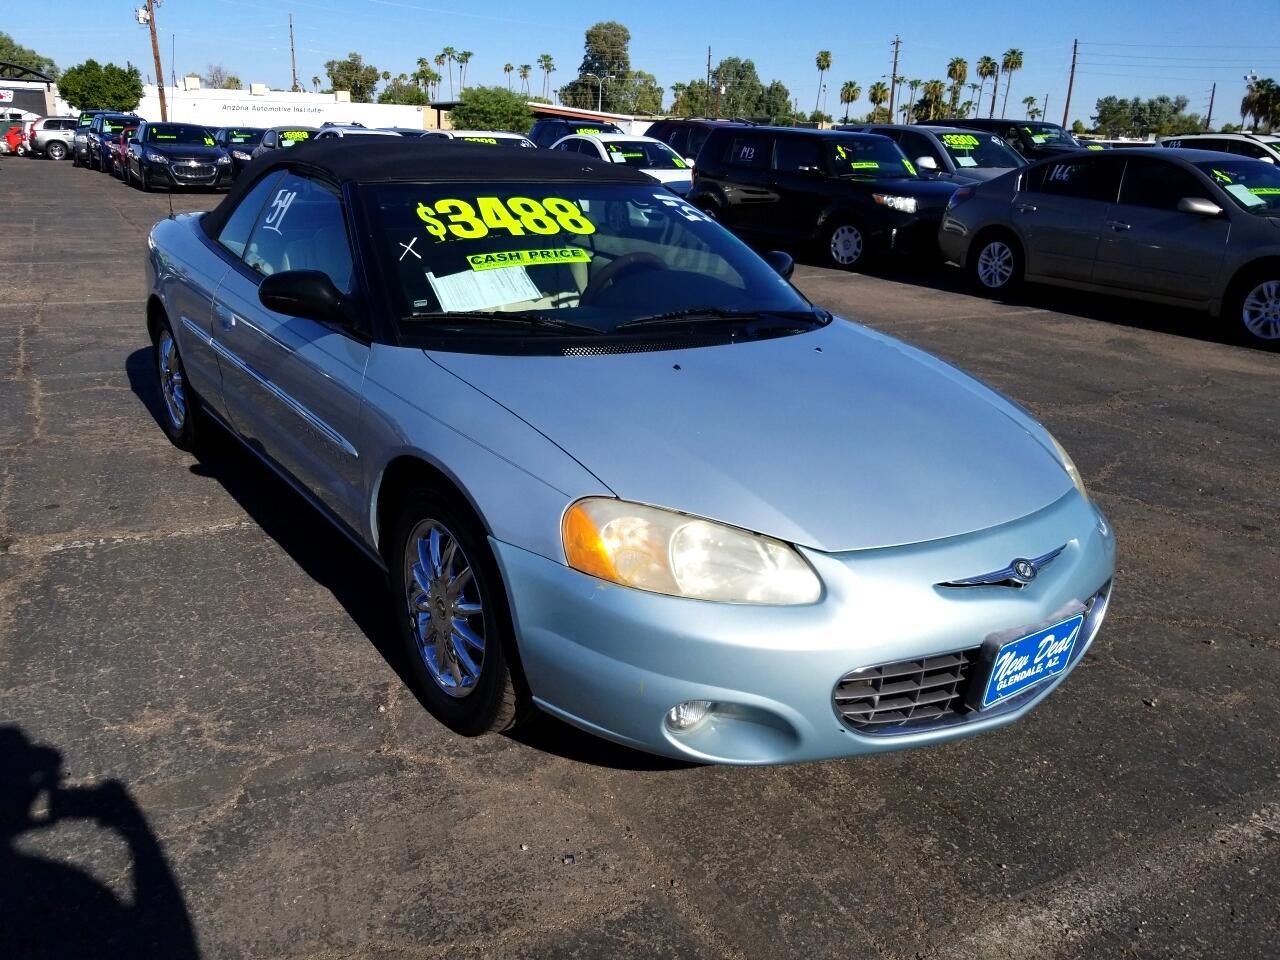 2001 Chrysler Sebring Limited Convertible